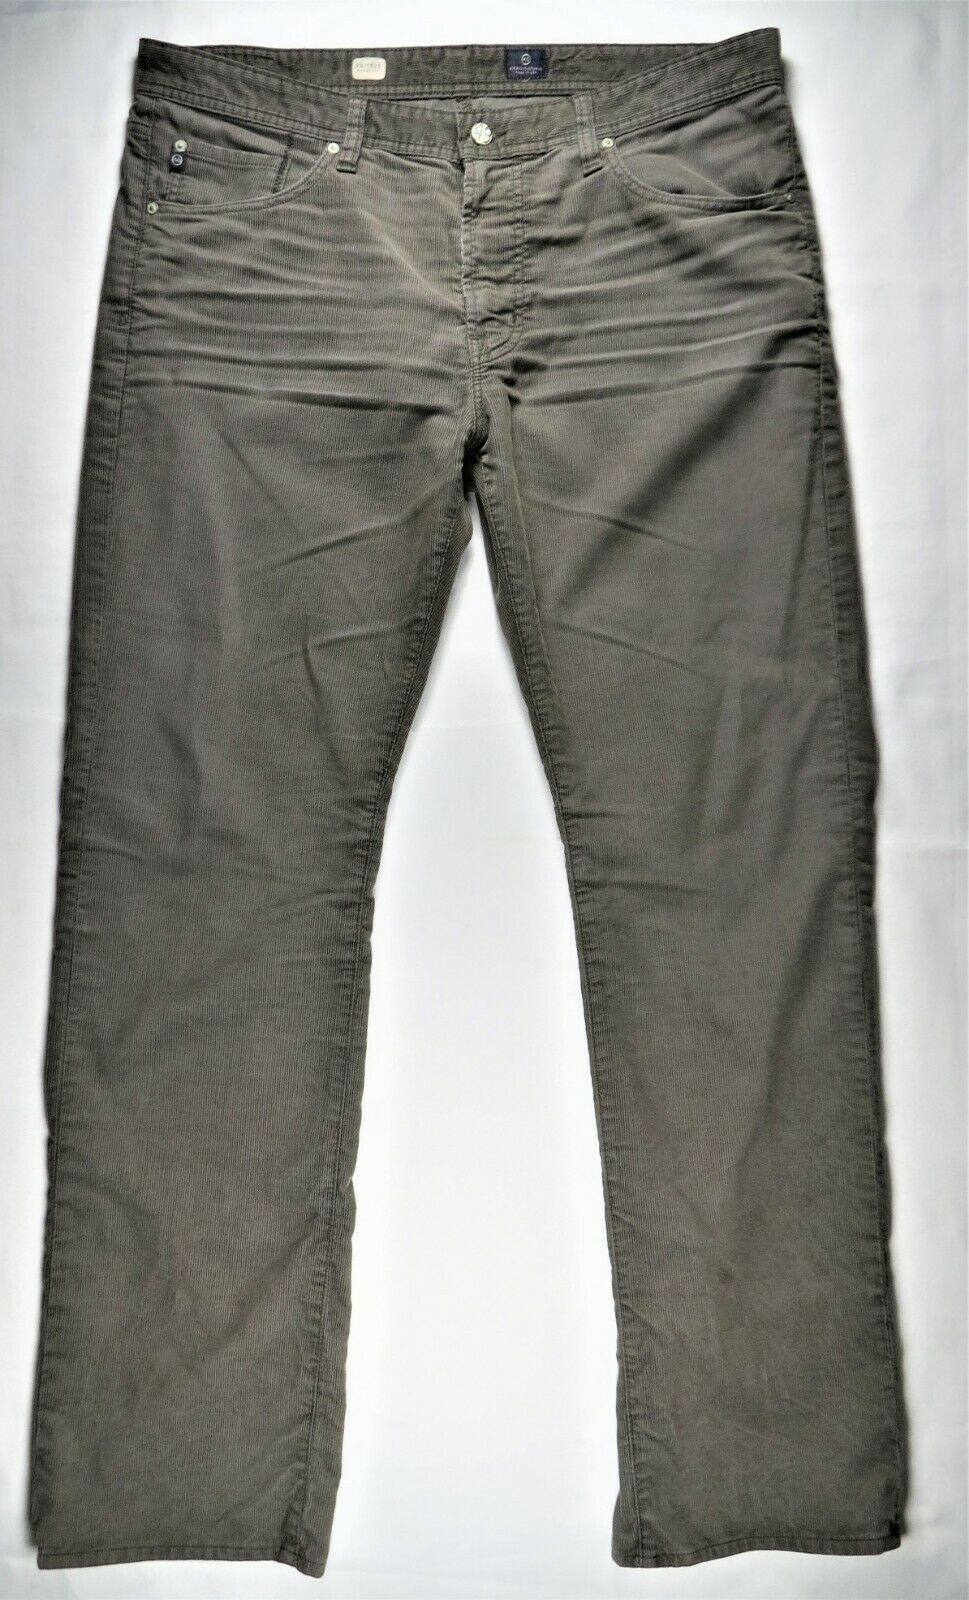 AG Adriano goldschmied Predege Mens Corduroy Pants 40x34 Straight Leg USA-Made